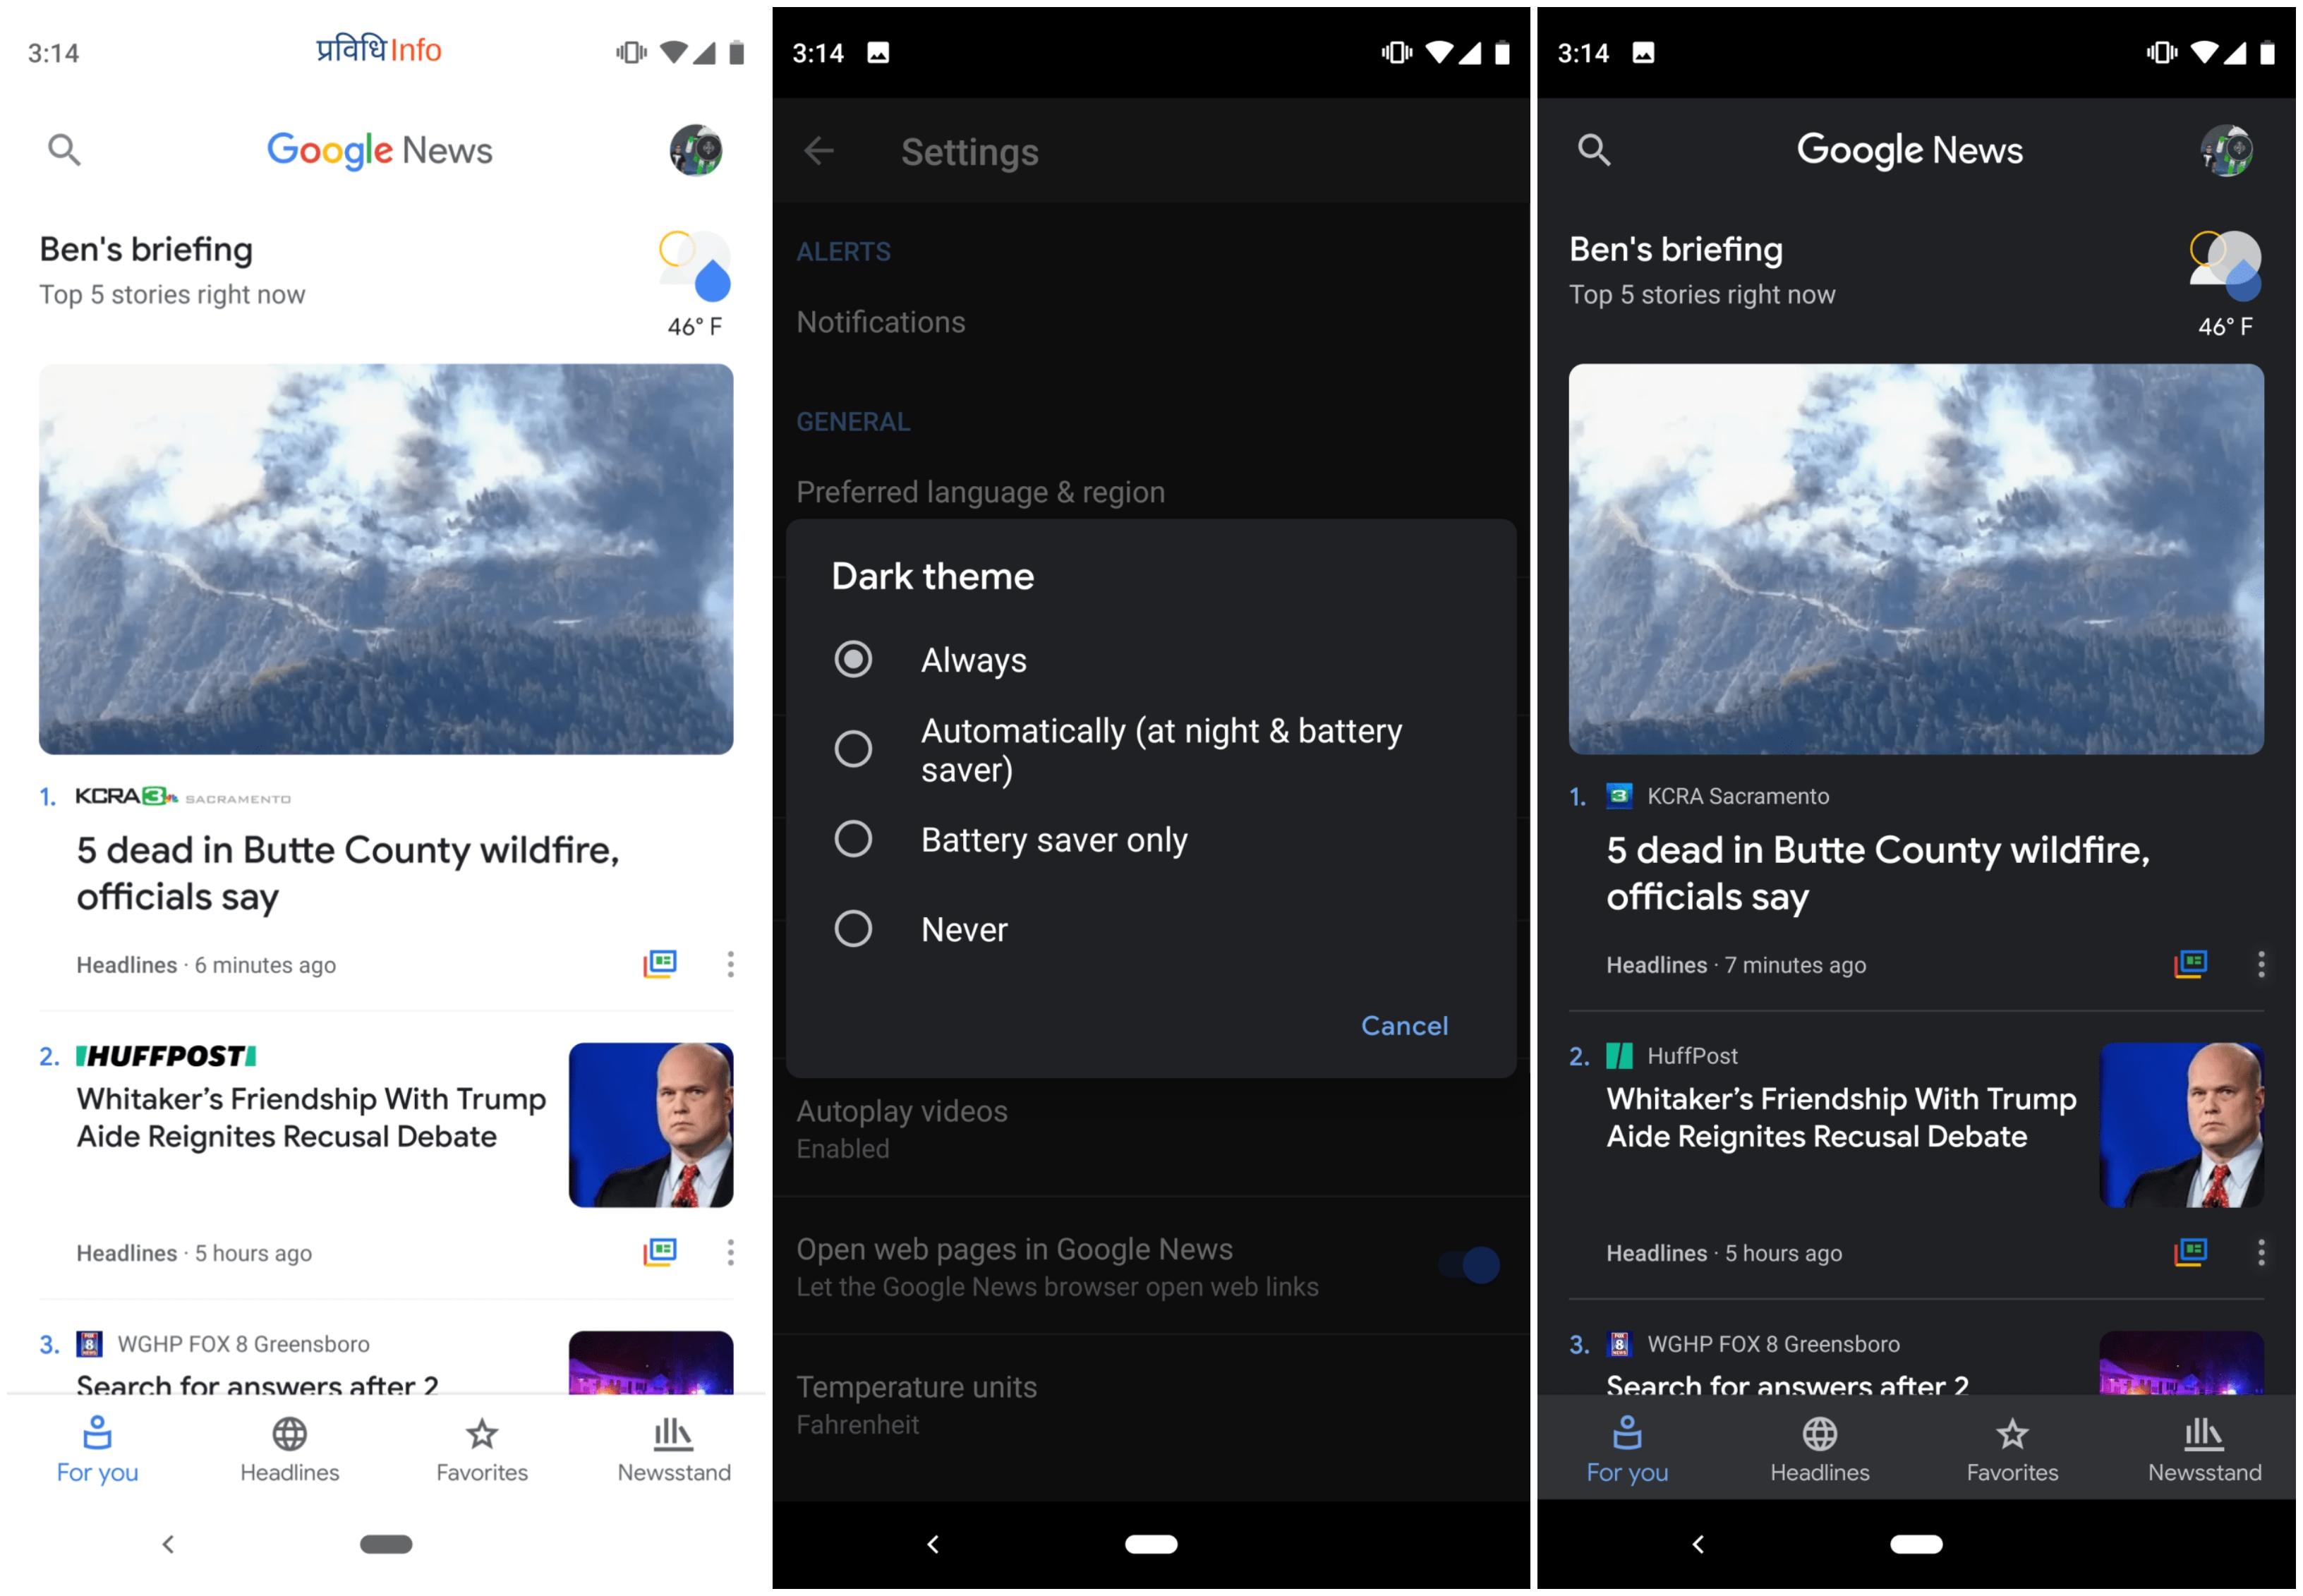 Dark Theme on Google News Android